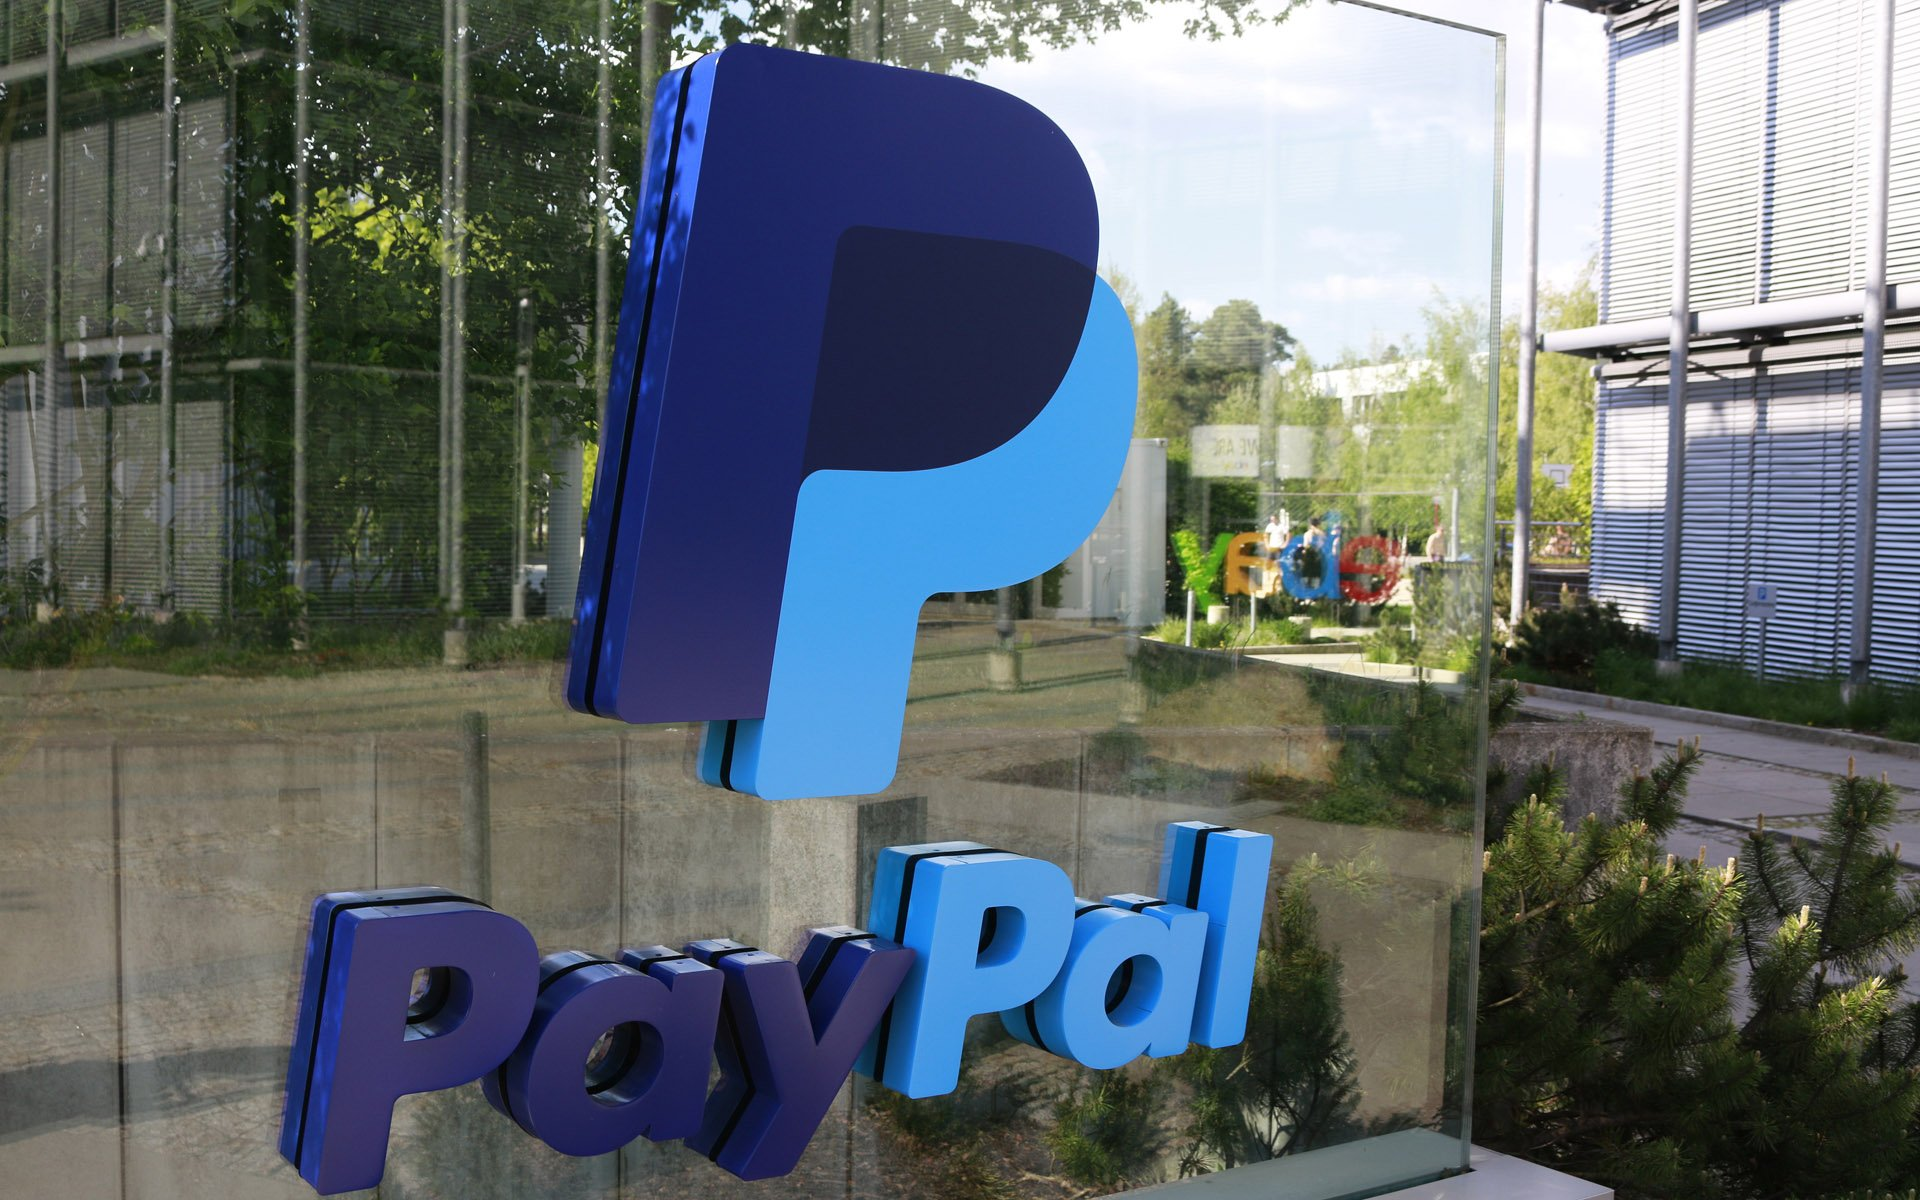 Paypal file lawsuit again CFPB